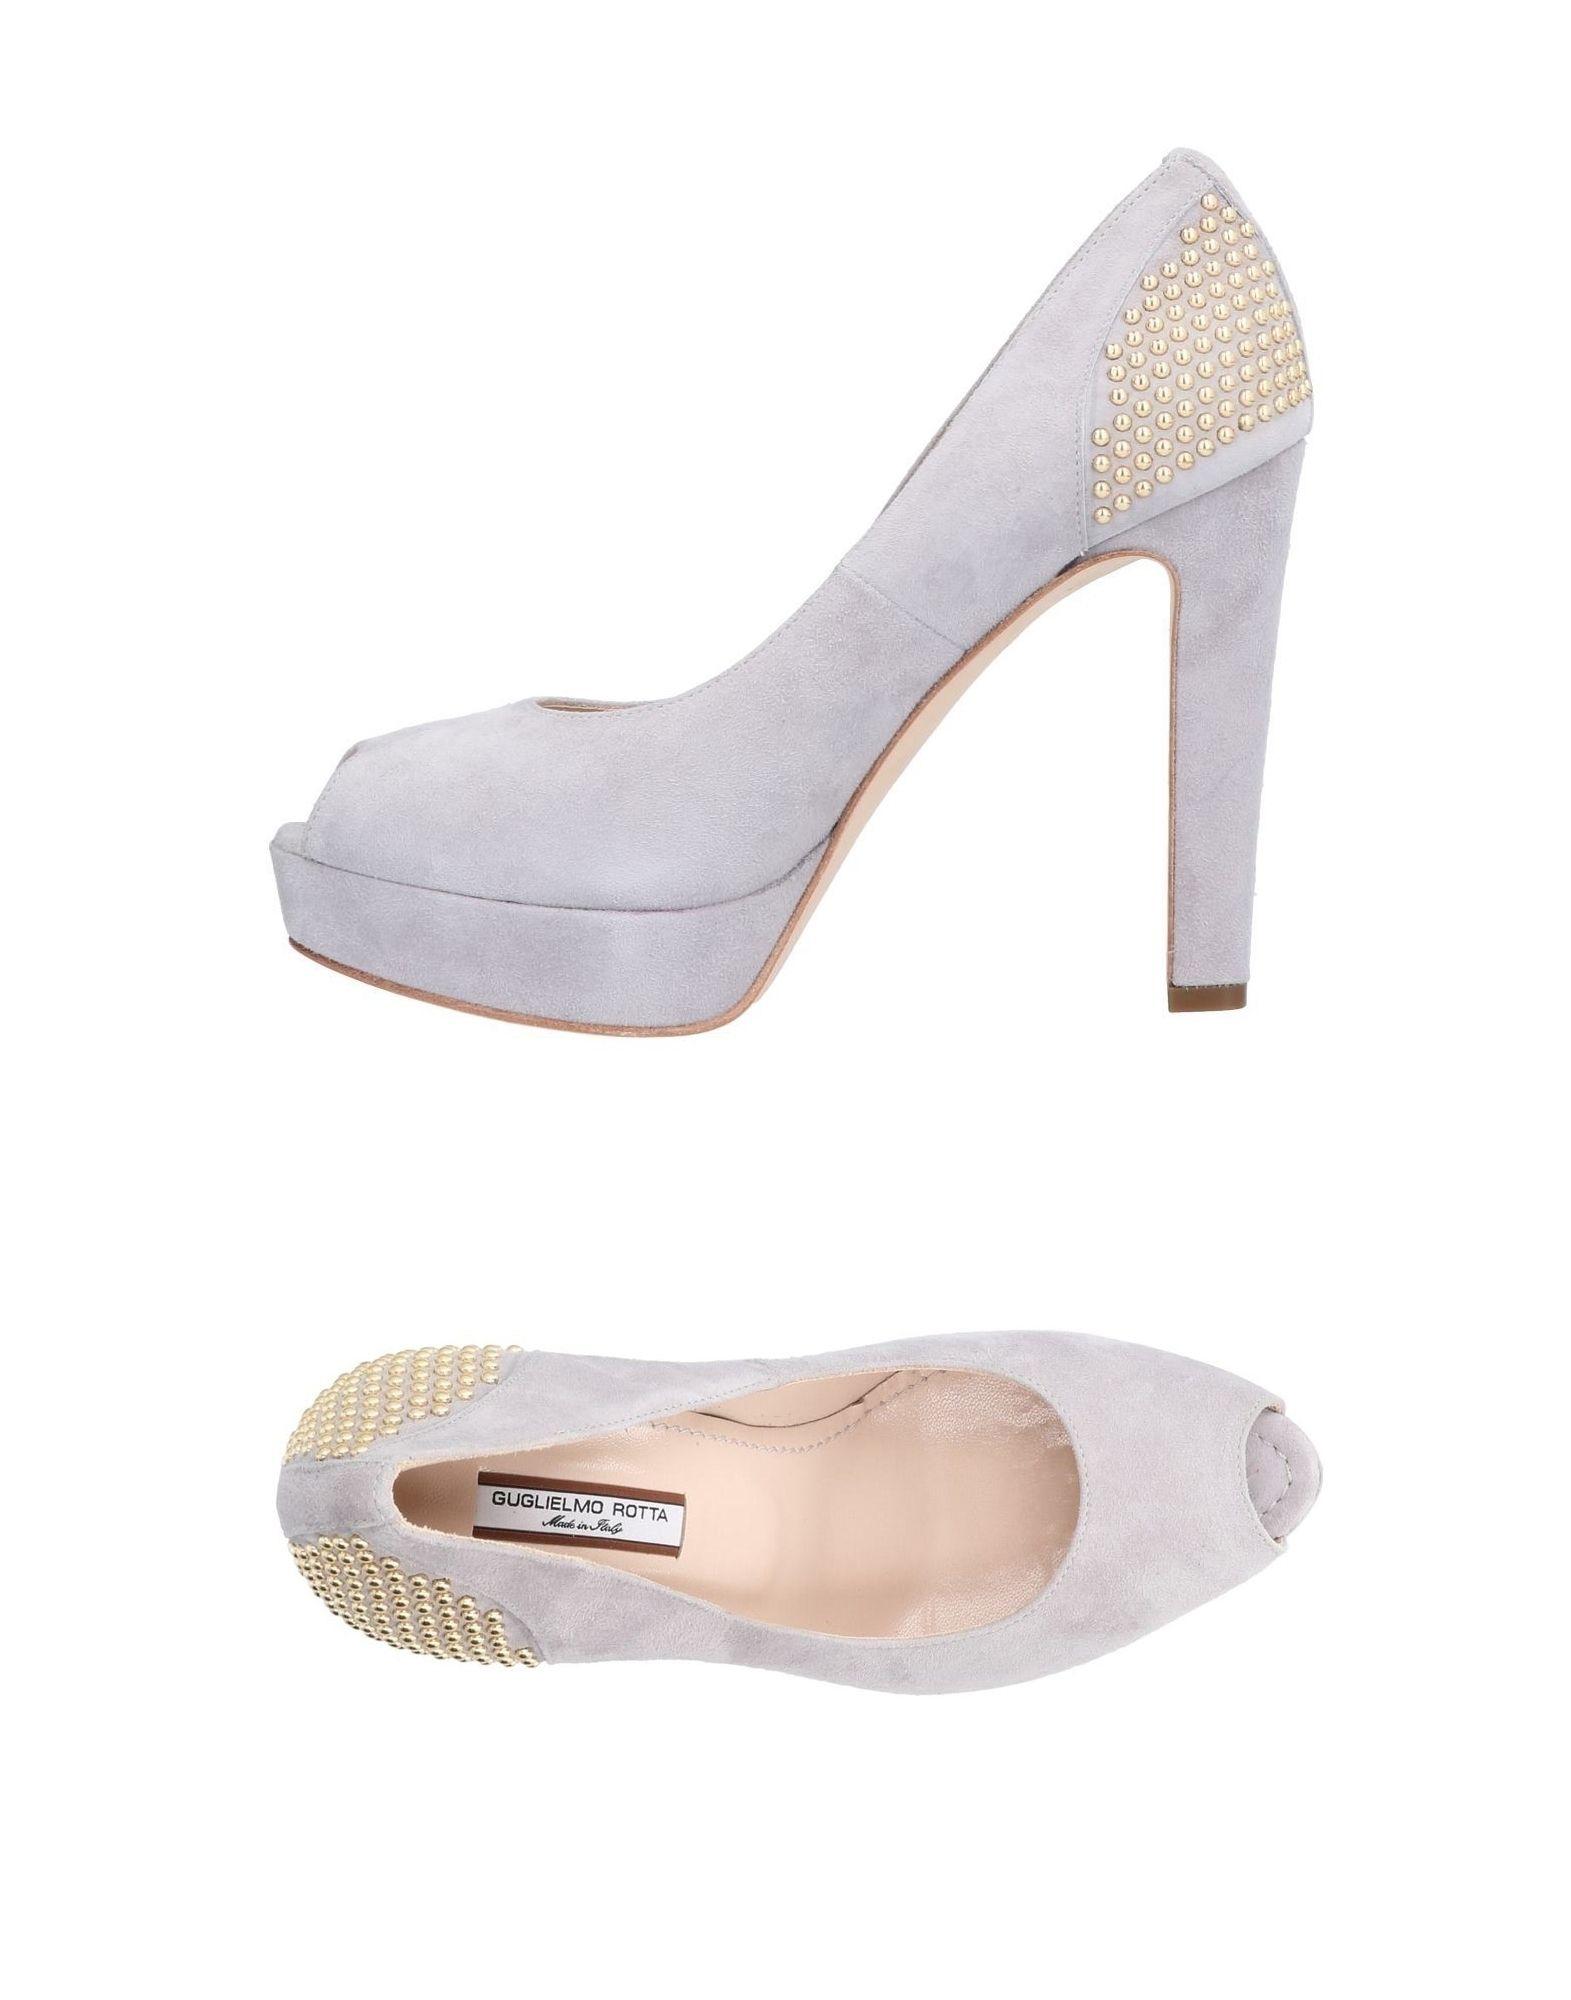 Guglielmo Rotta Pumps Damen  11431040CL Gute Qualität beliebte Schuhe